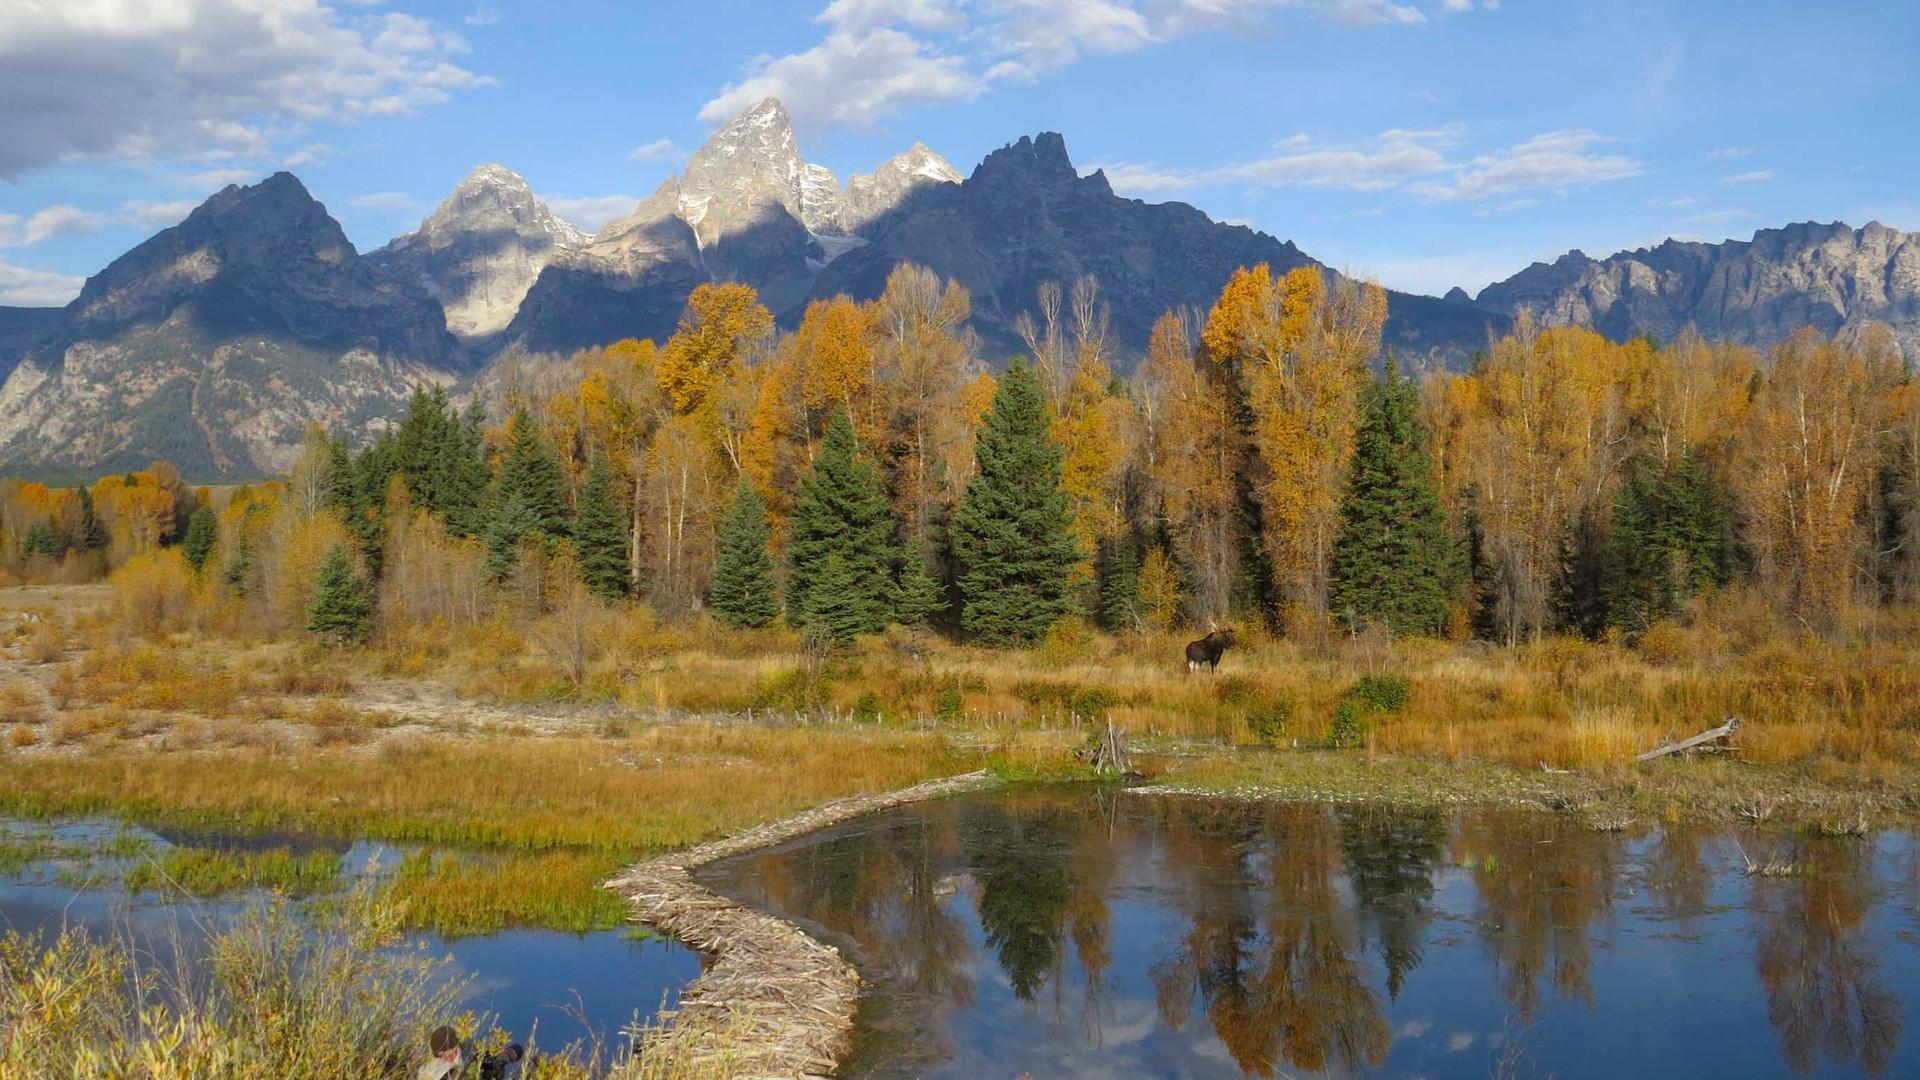 Yellowstone-Day-Tours-Tetons-in-Fall.jpg